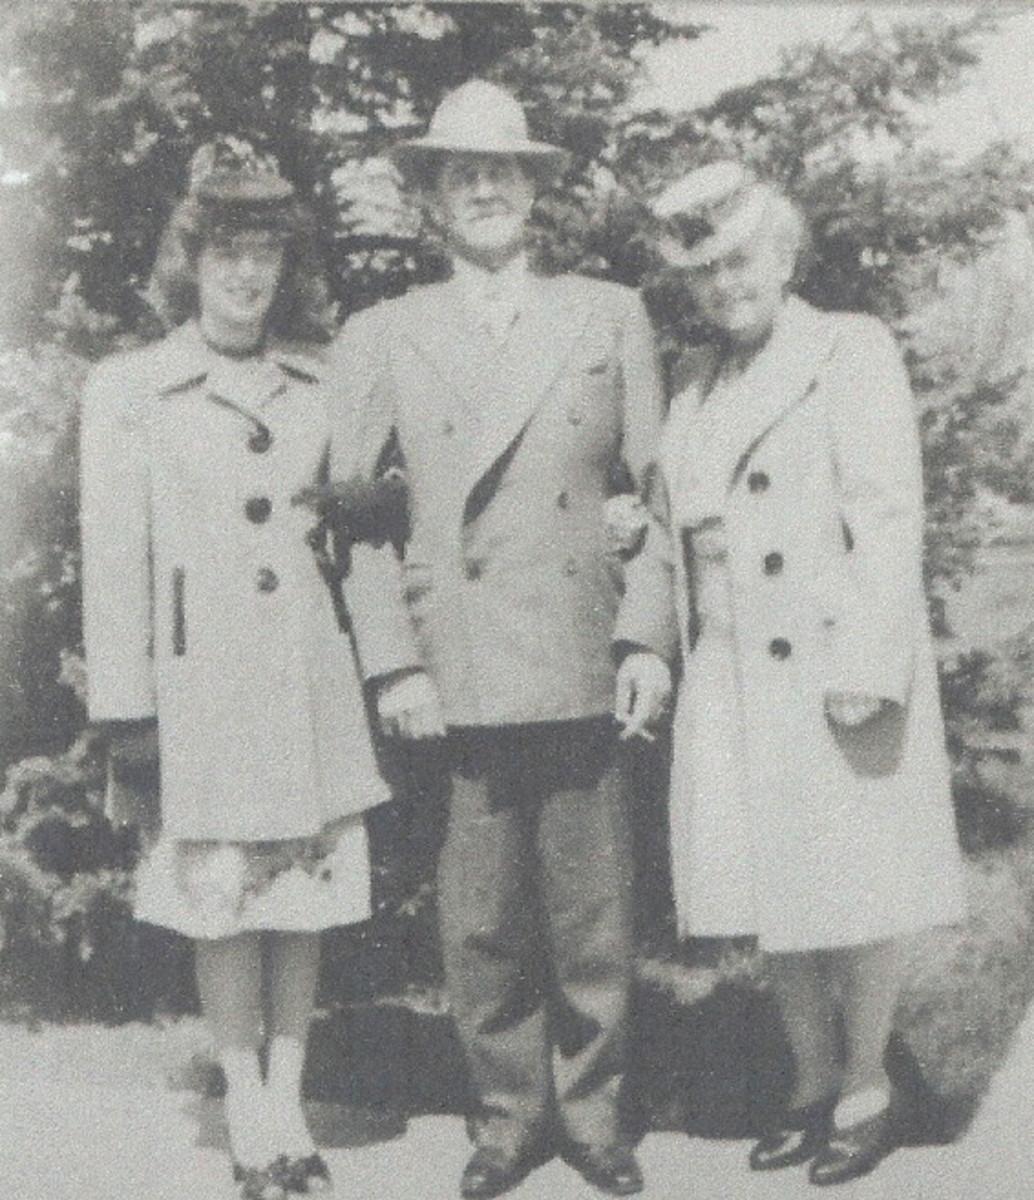 Grandma Lottie w/ Grandpa Leach & Grandma Brown